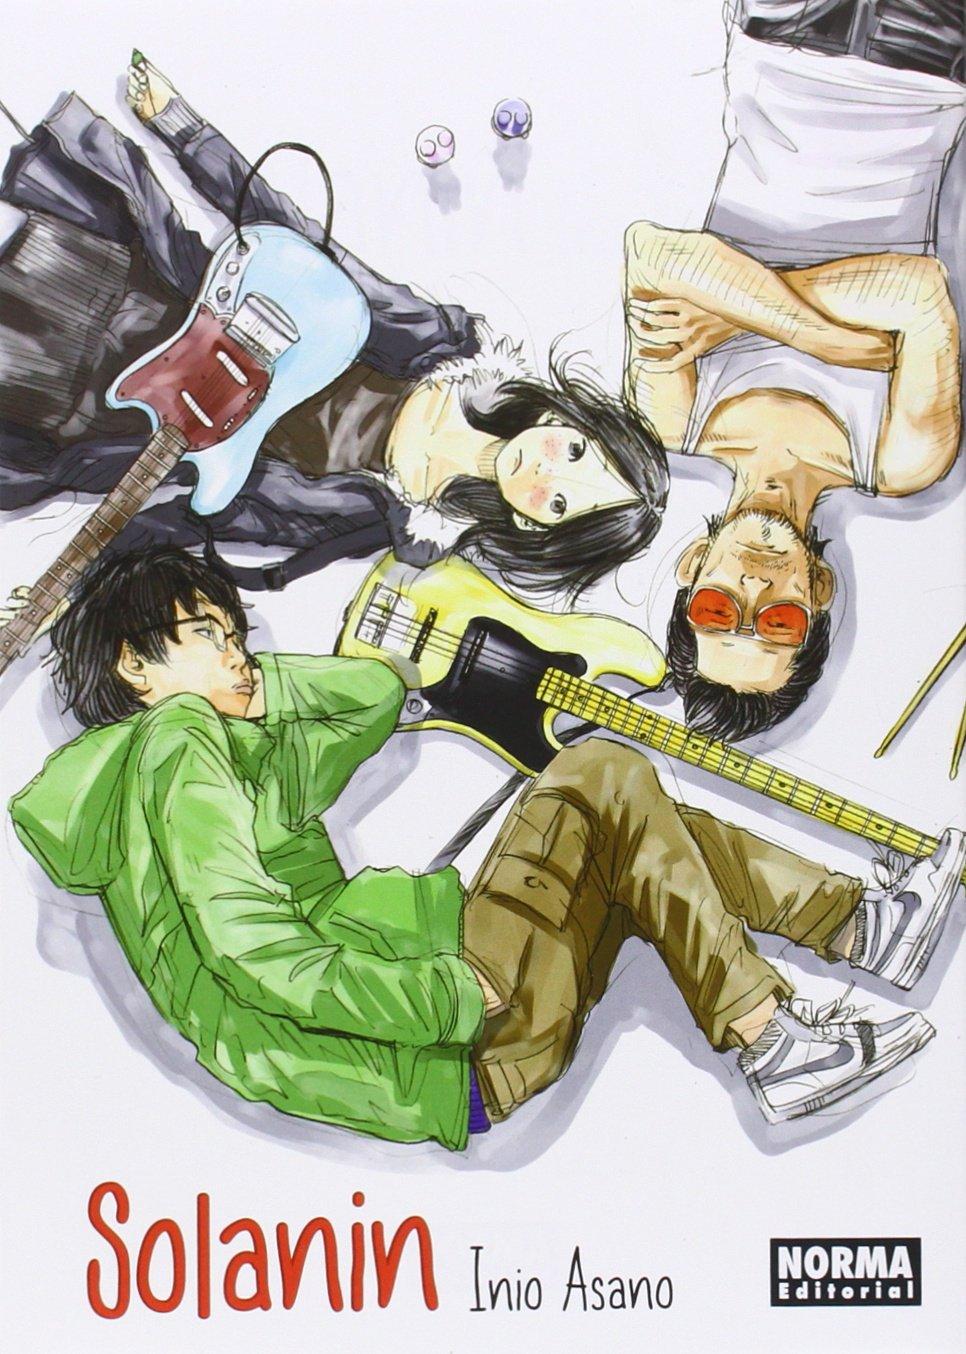 Solanin (Manga (norma)) Tapa blanda – 30 oct 2014 Inio Asano Norma Editorial 8467917369 Graphic novels: Manga